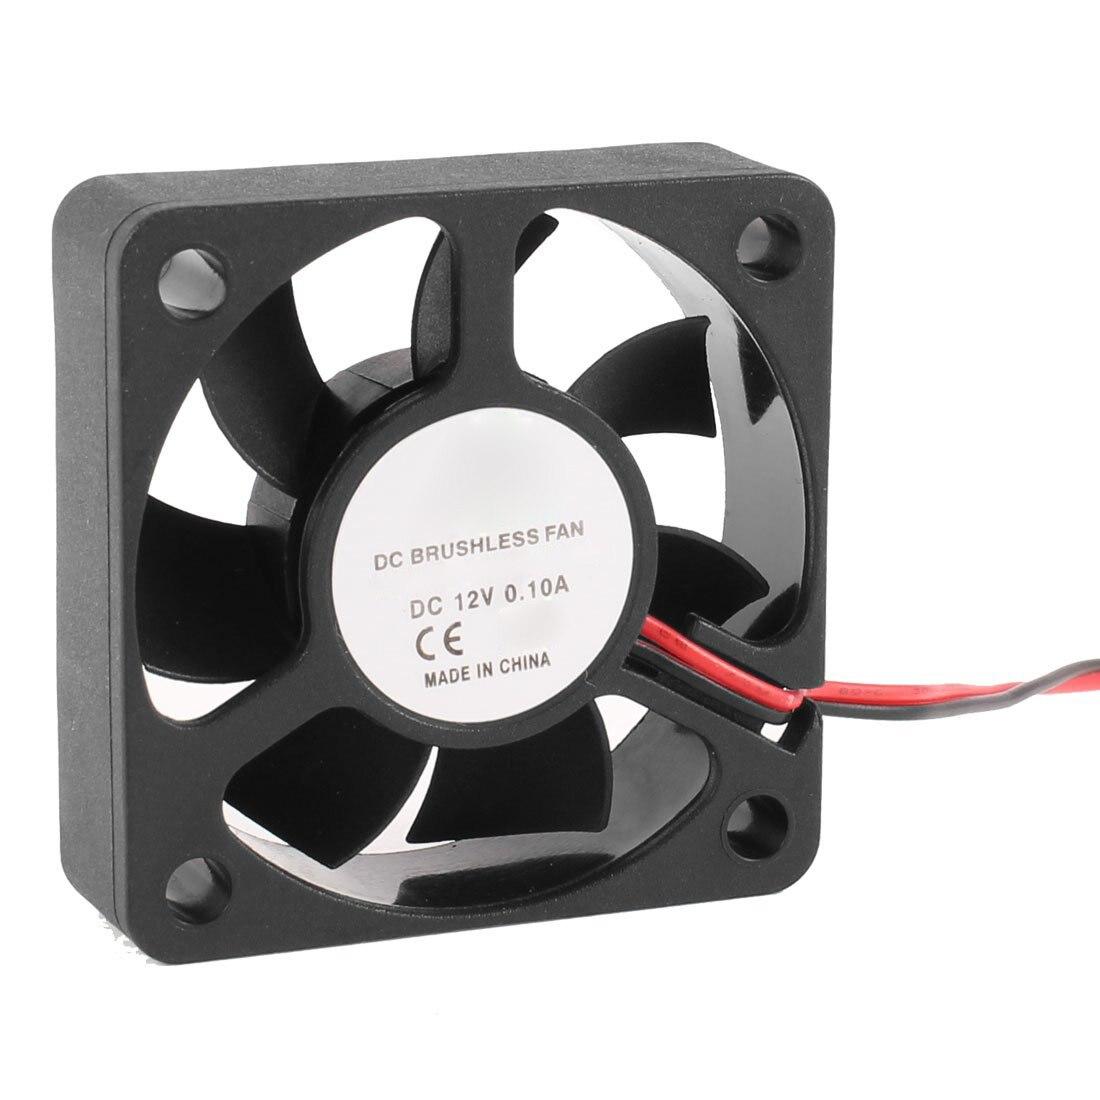 GTFS-Hot 50mm 12V 2Pin 4000RPM Sleeve Bearing PC Case CPU Cooler Cooling Fan 75mmx30mm dc 12v 0 24a 2 pin computer pc sleeve bearing blower cooling fan 7530 r179t drop shipping